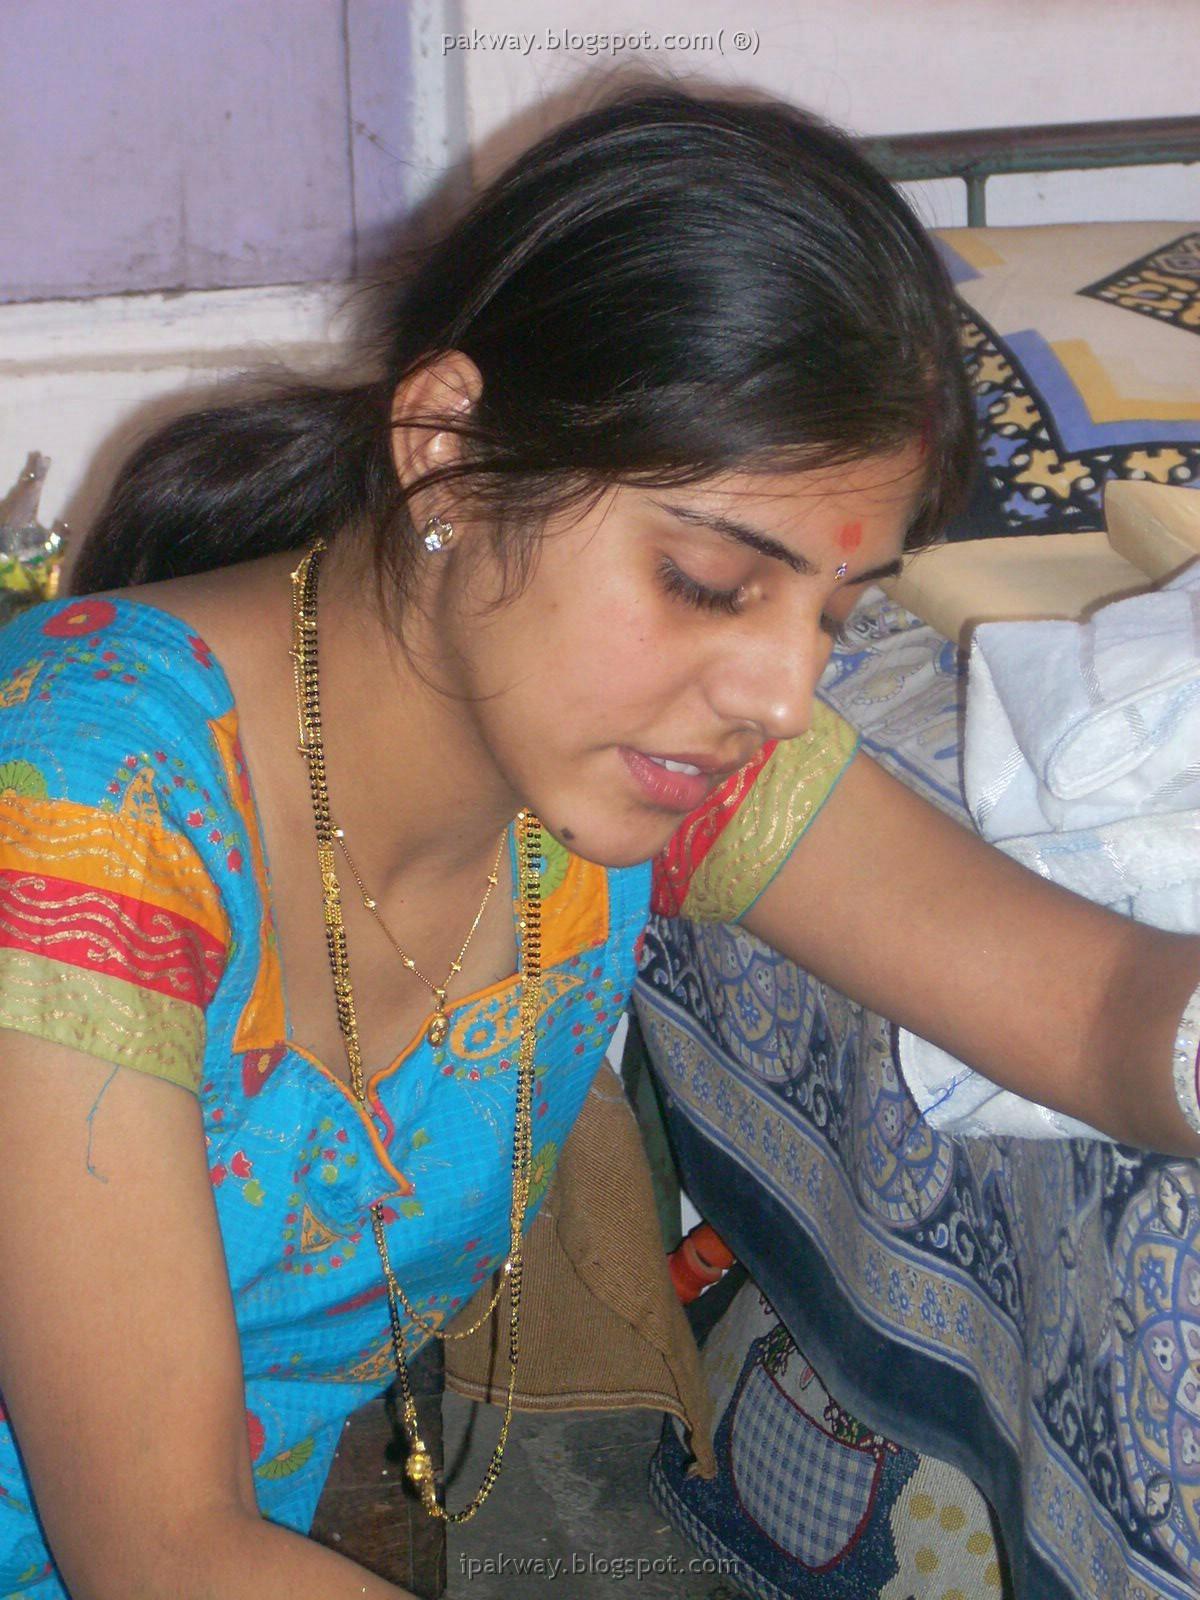 Innocent Beauty Of Desi Face Posted By  E2 99 A5 Narmi E2 99 A